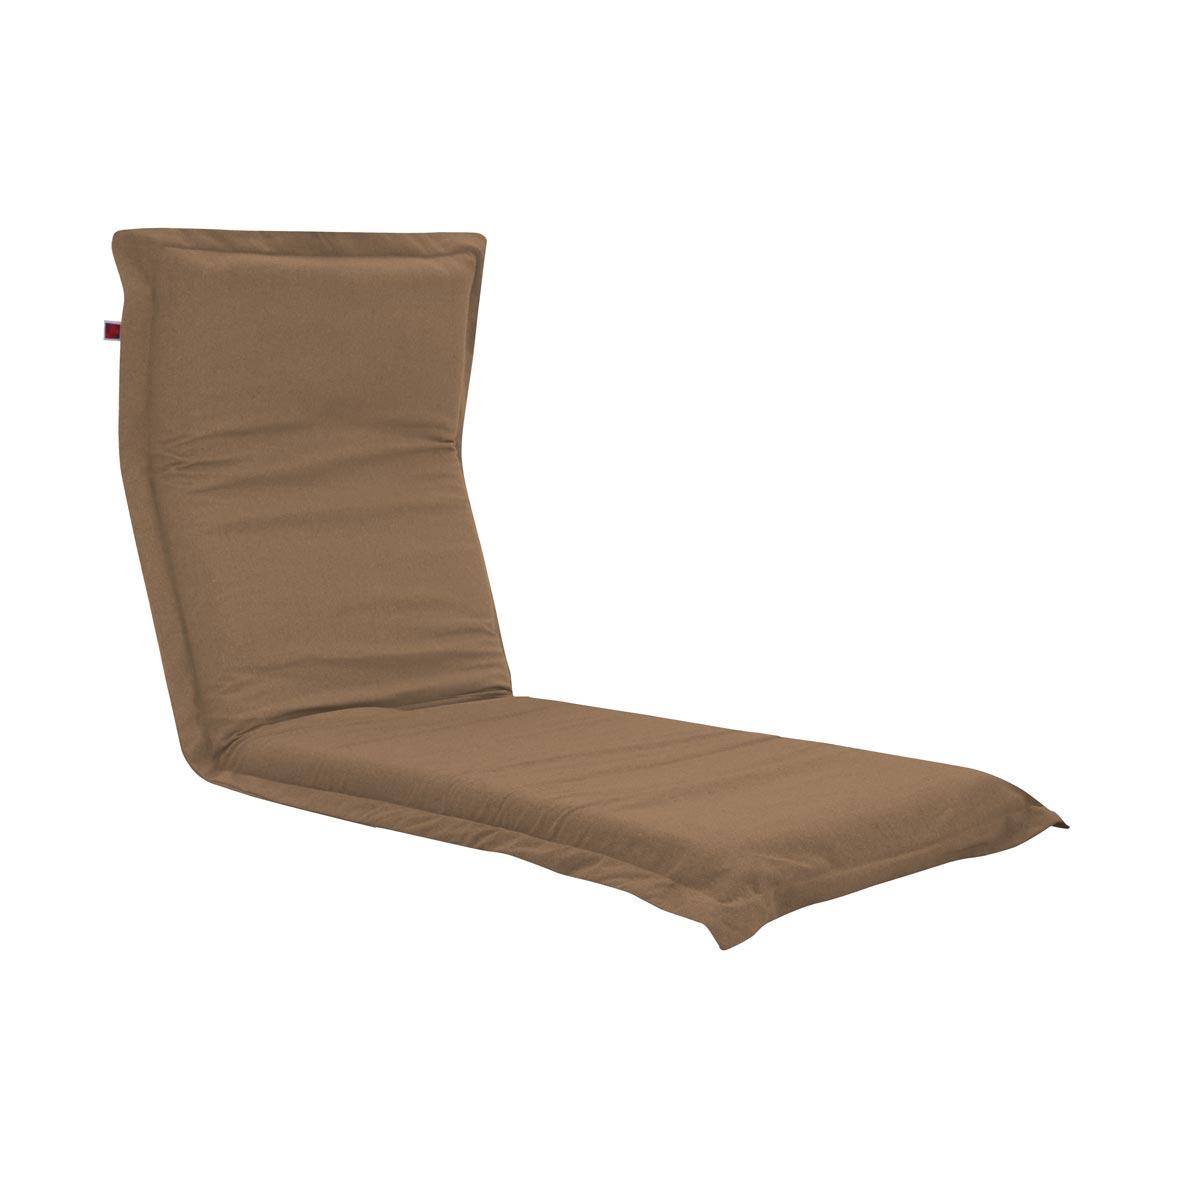 Pufe ClicClac Uno Lounge Tecido Ecolona Kraft 02 03b